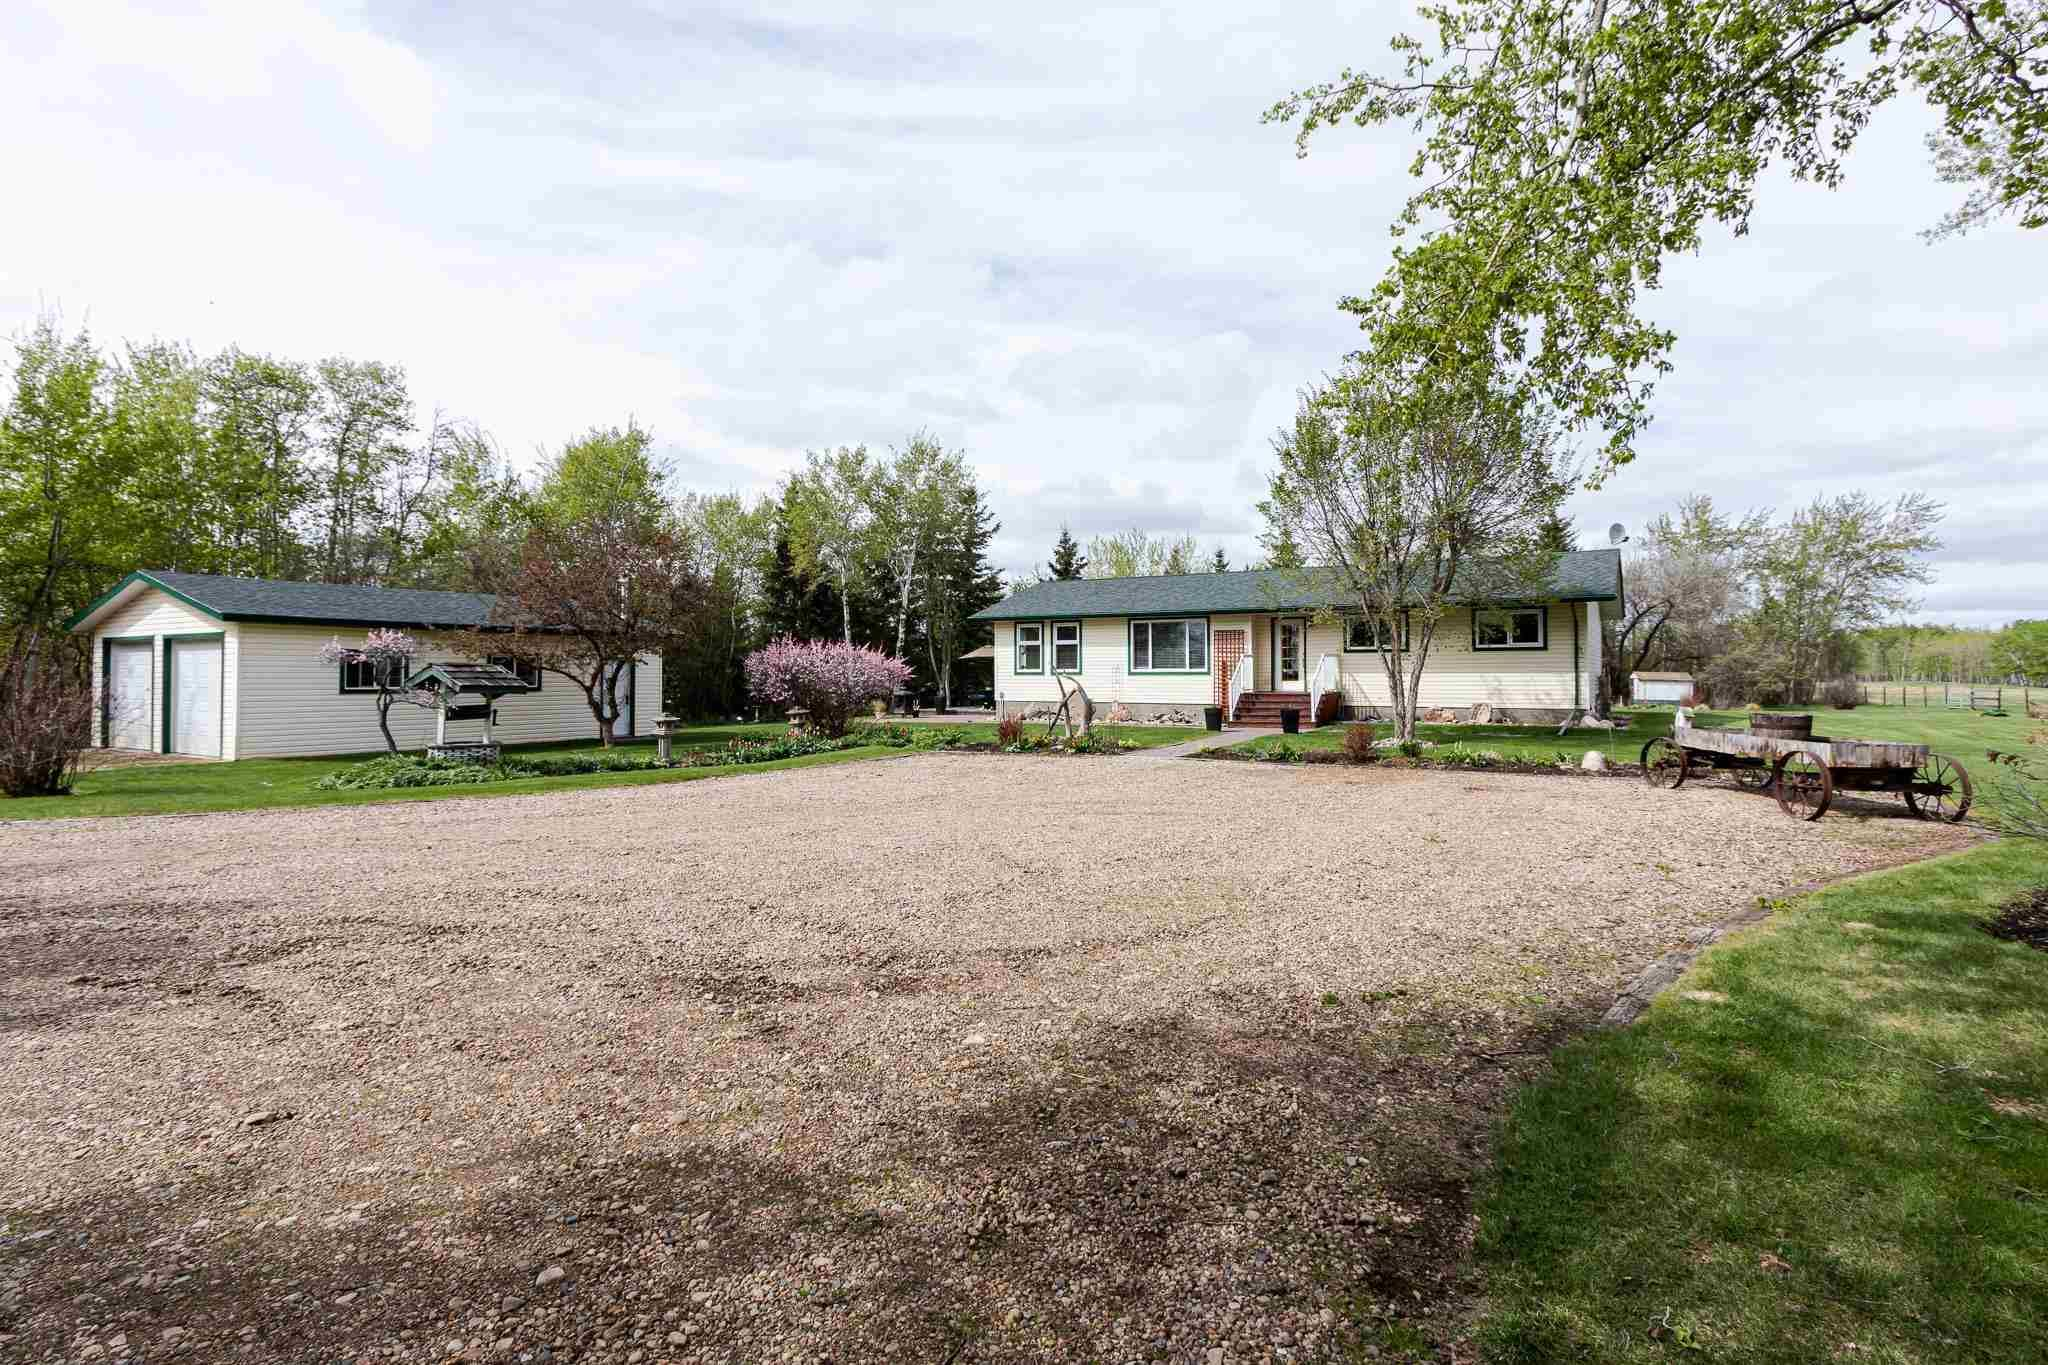 Main Photo: 57101 RGE RD 231: Rural Sturgeon County House for sale : MLS®# E4245858